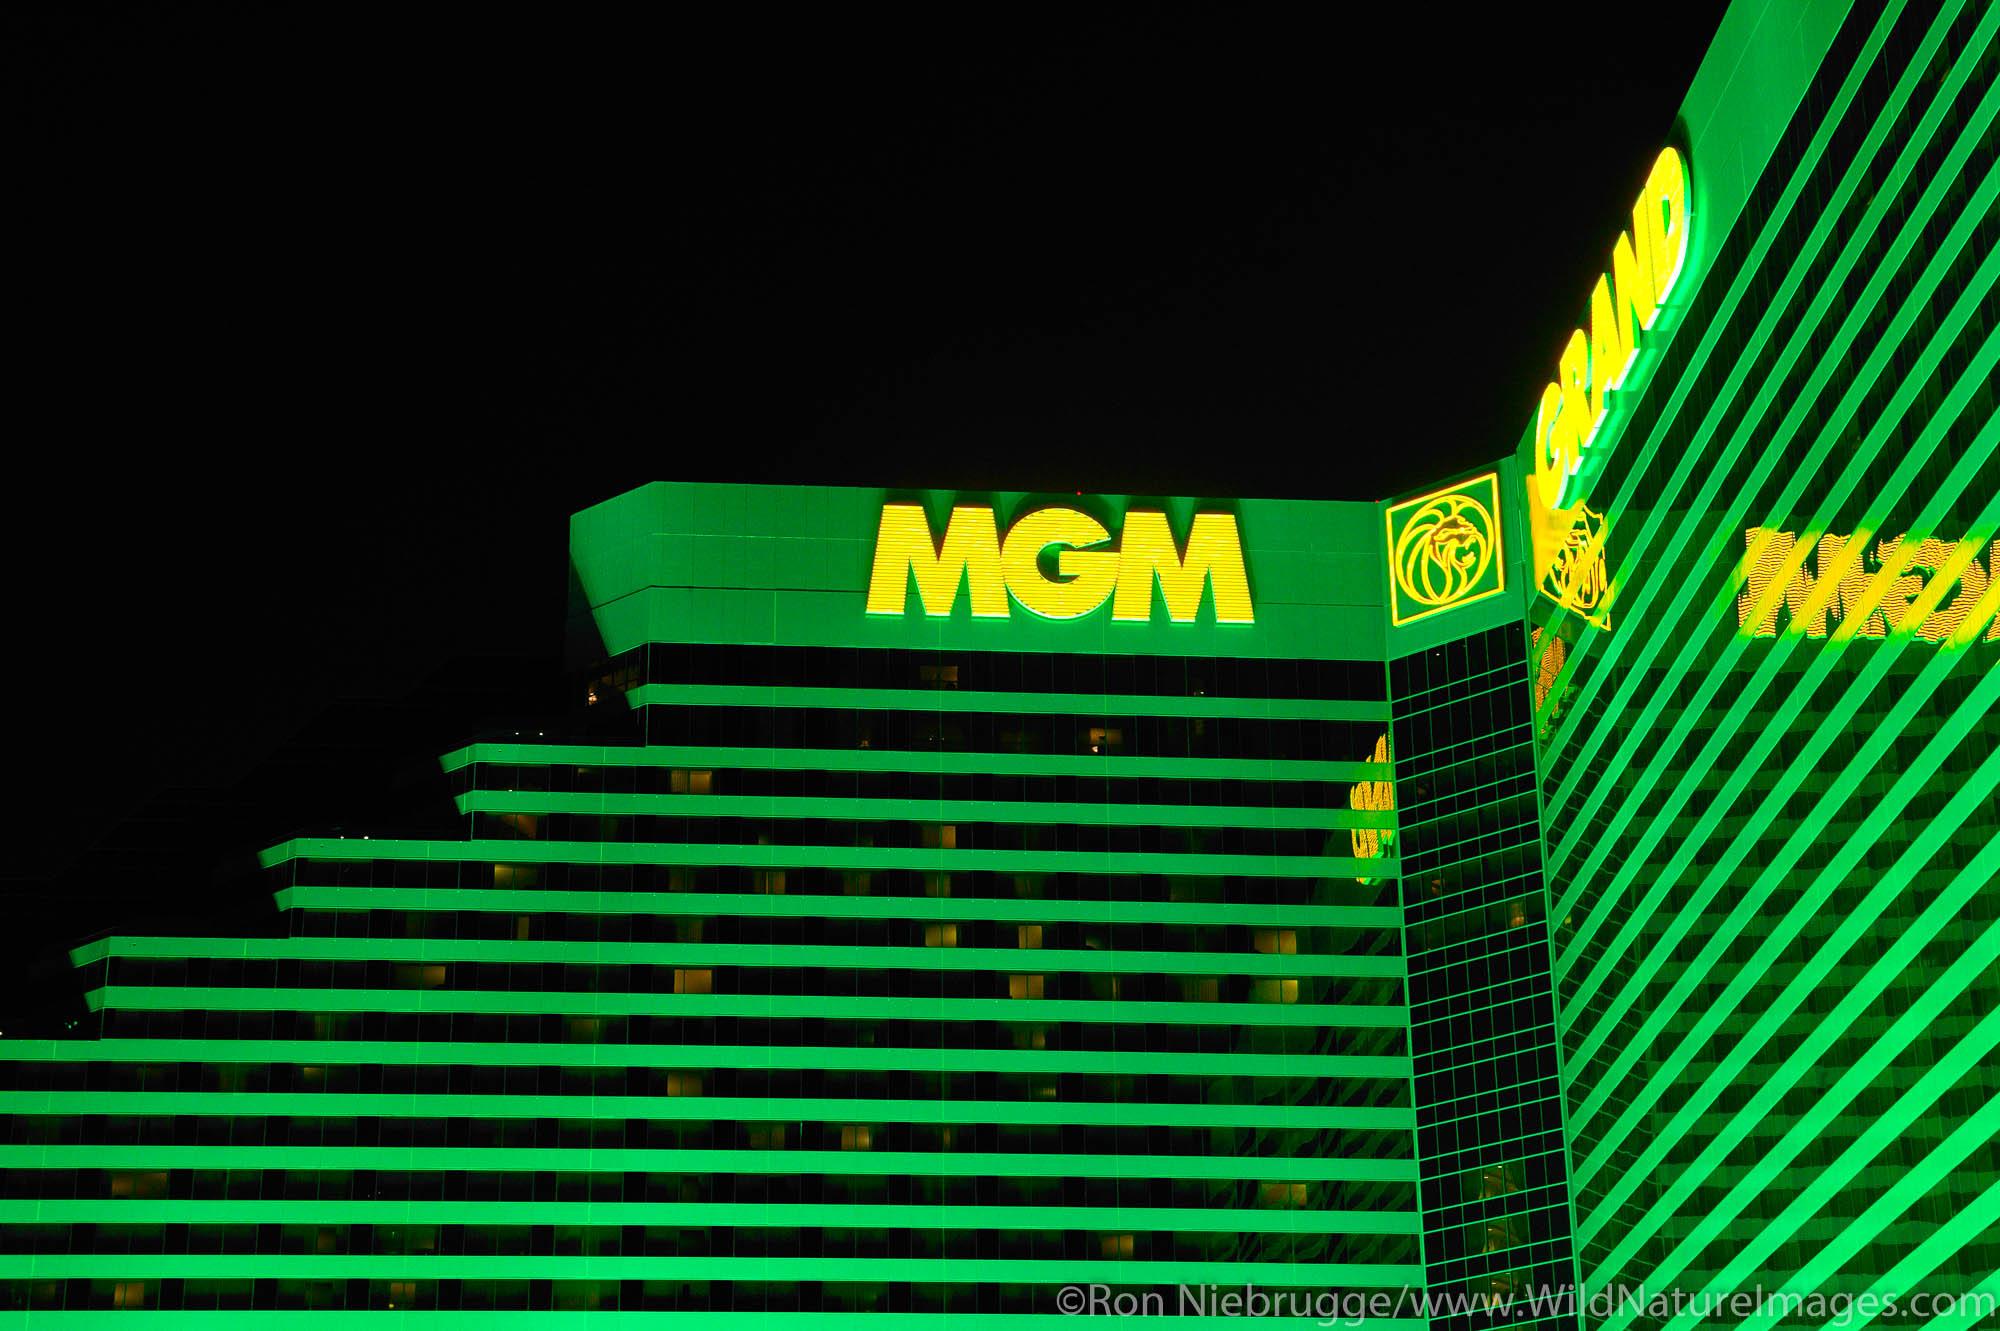 MGM Grand on the strip, Las Vegas, Nevada.